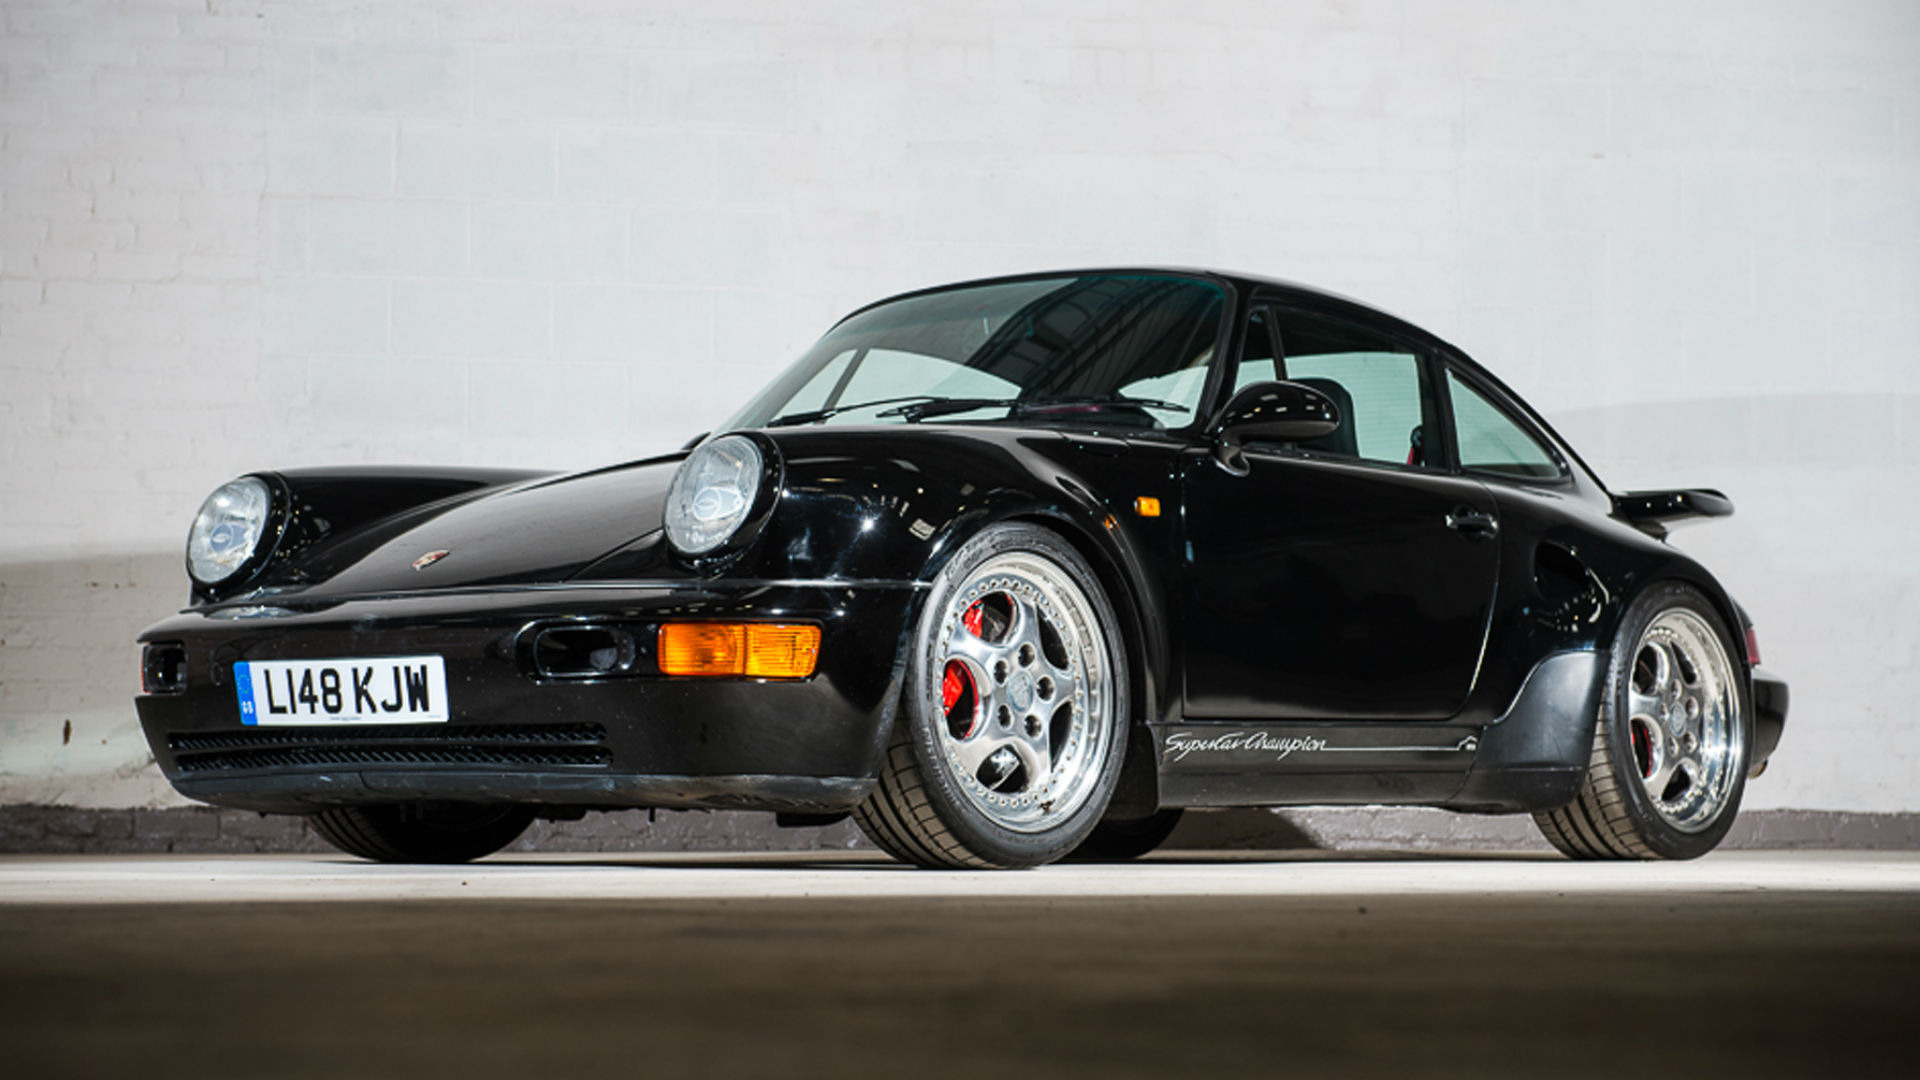 Rare Porsche 911 Leichtbau For Sale Has A Wonderfully 90s Interior